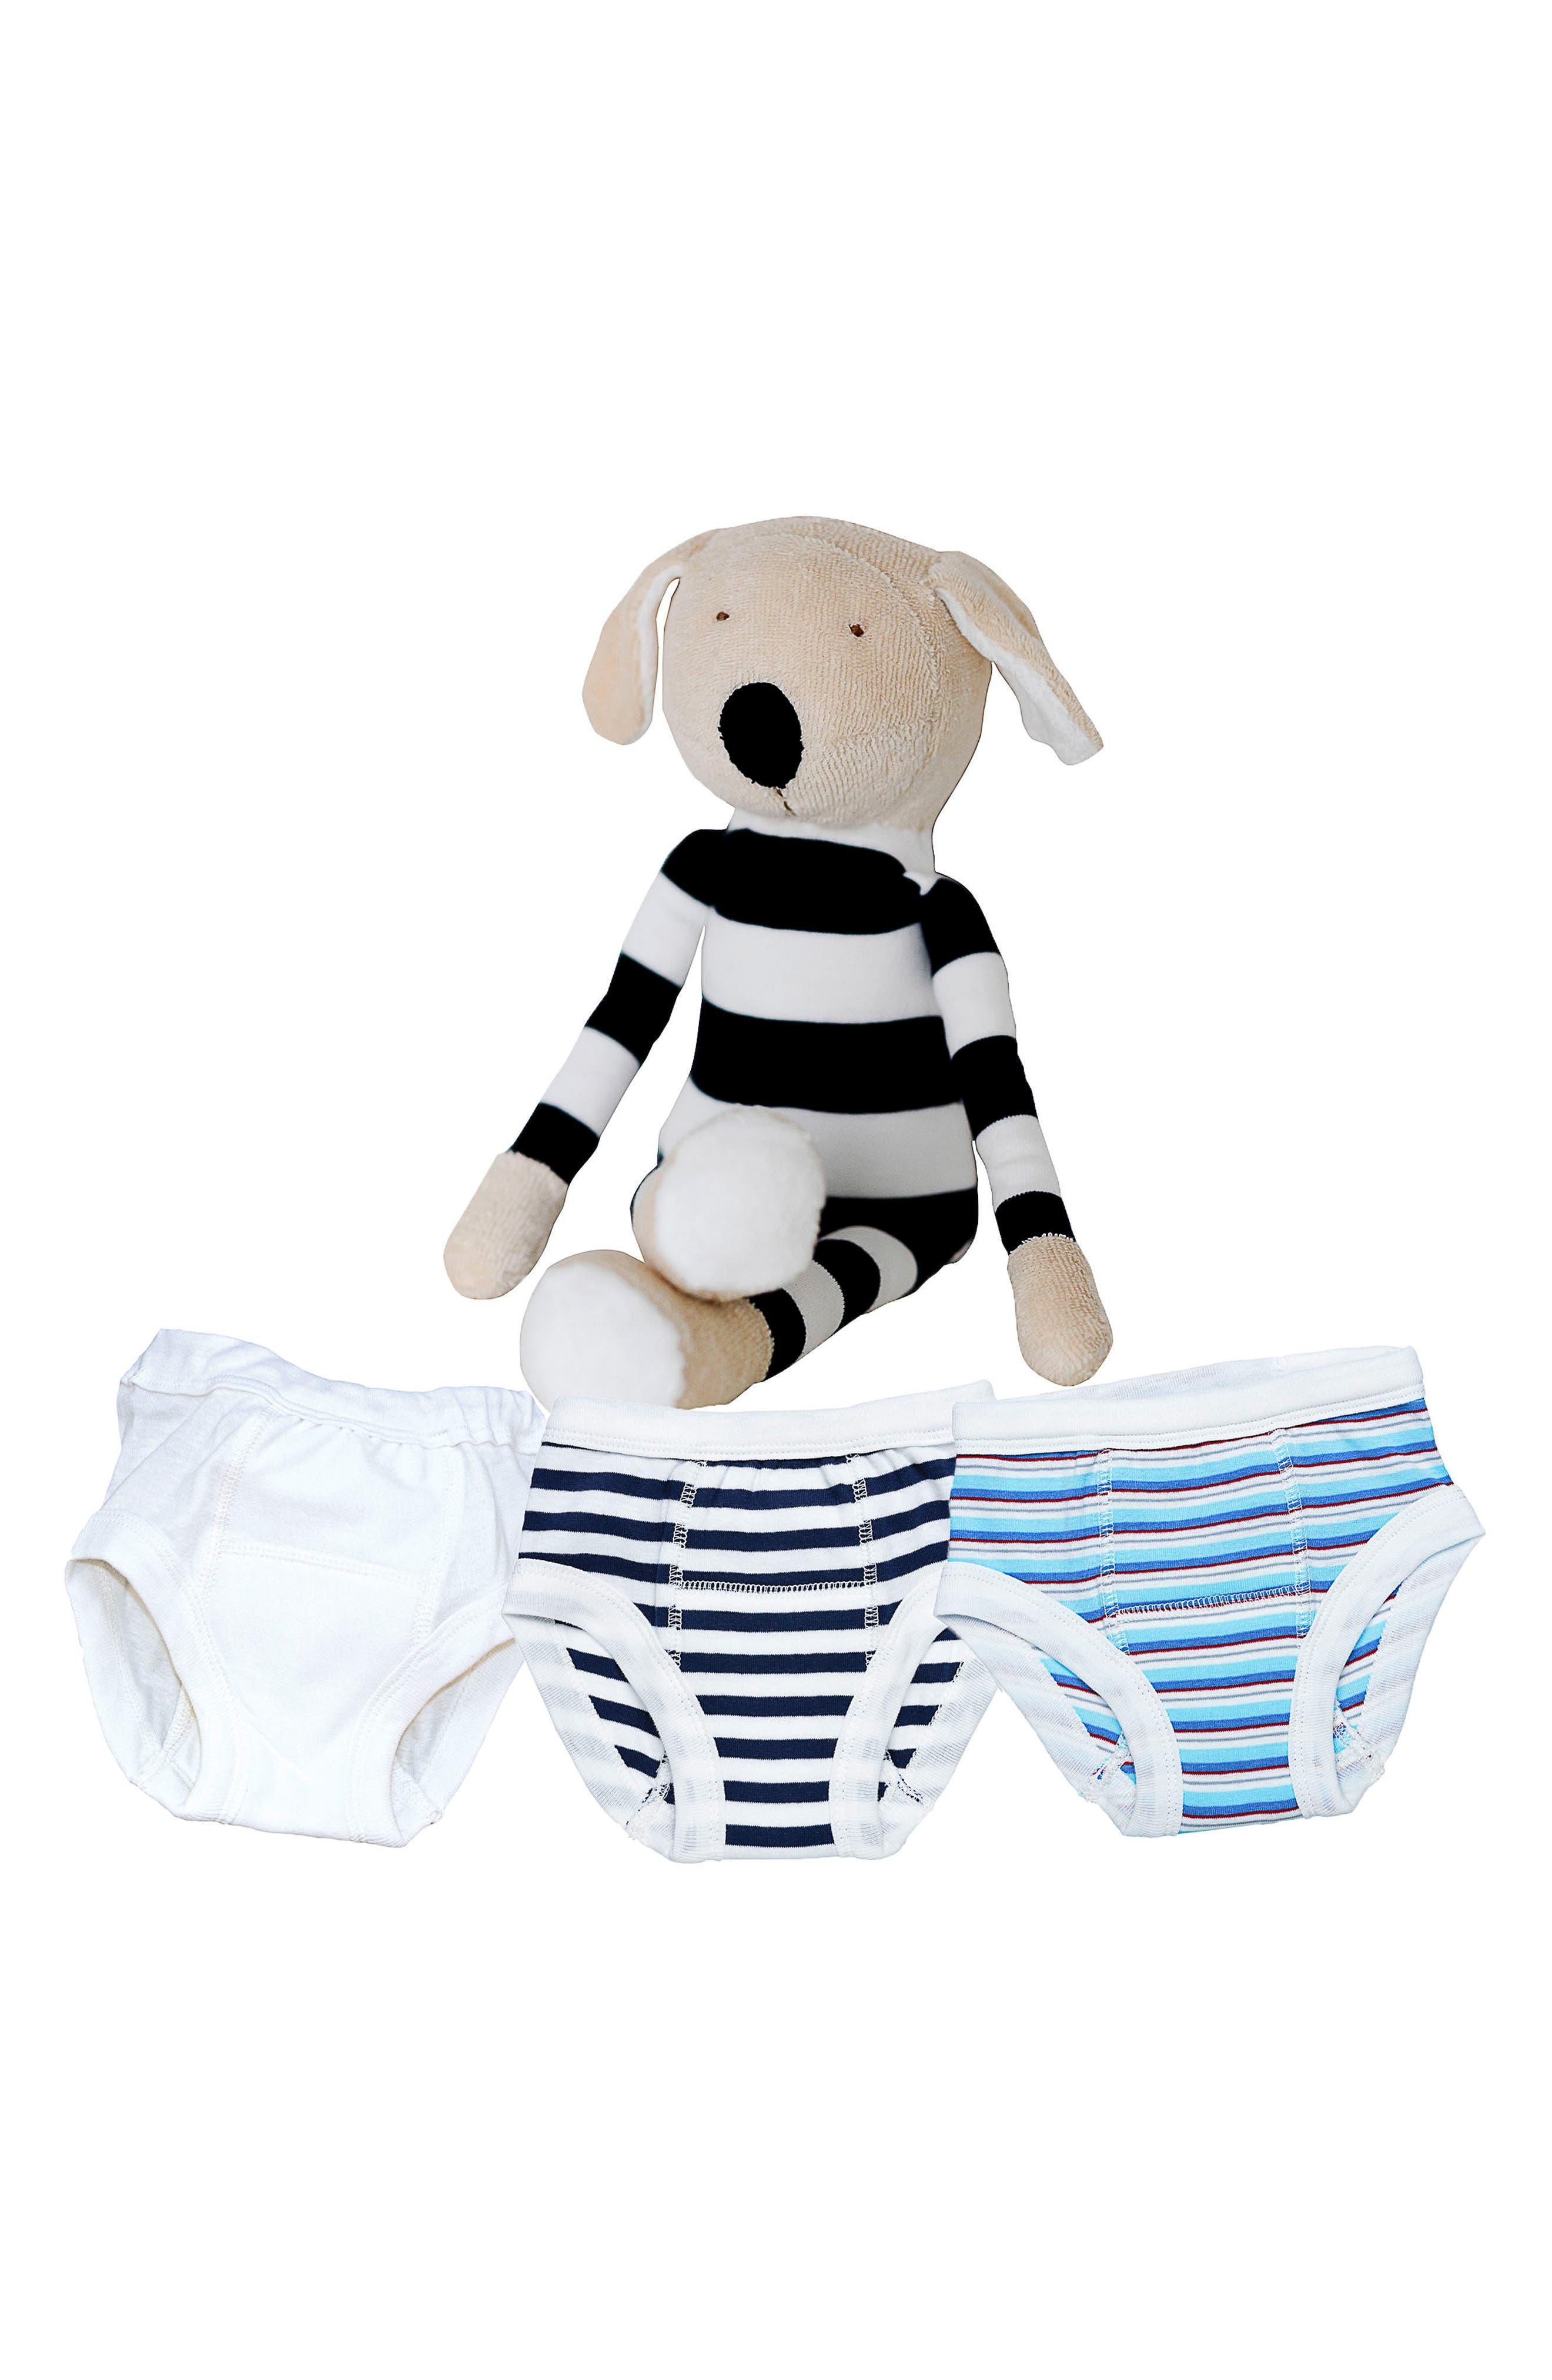 4-Piece Training Pants & Buddy Stuffed Animal Set,                             Main thumbnail 1, color,                             400